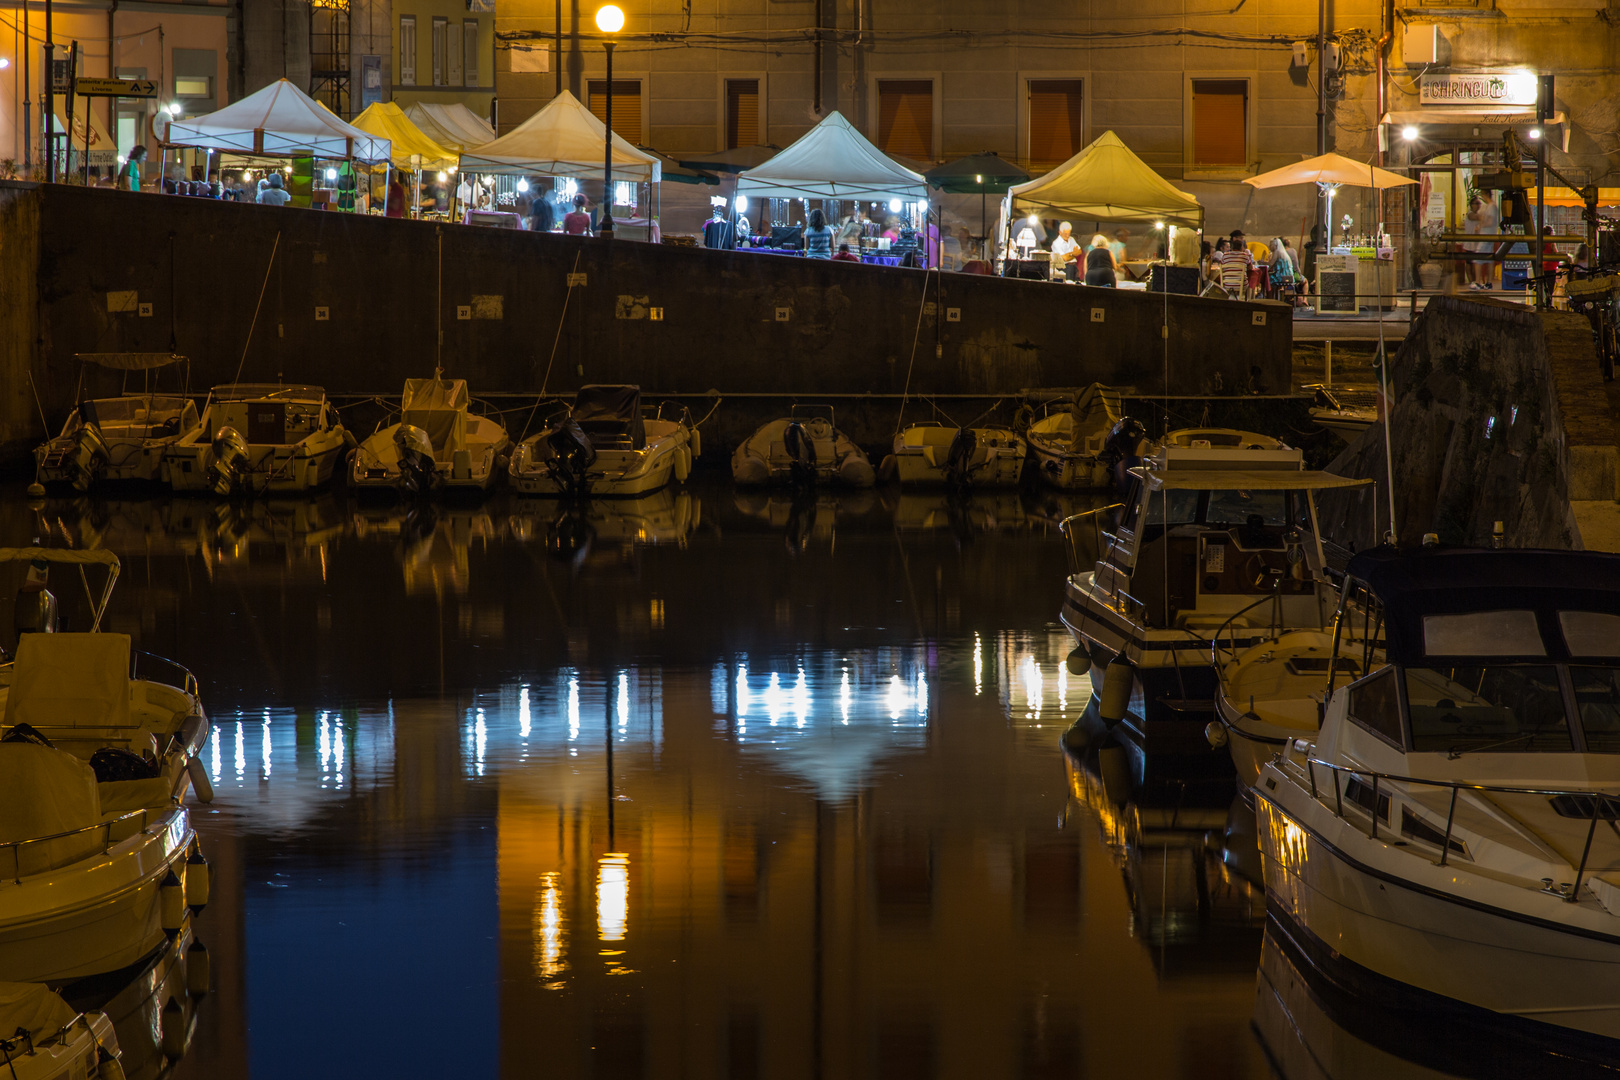 Livorno bei Nacht Nr. 1